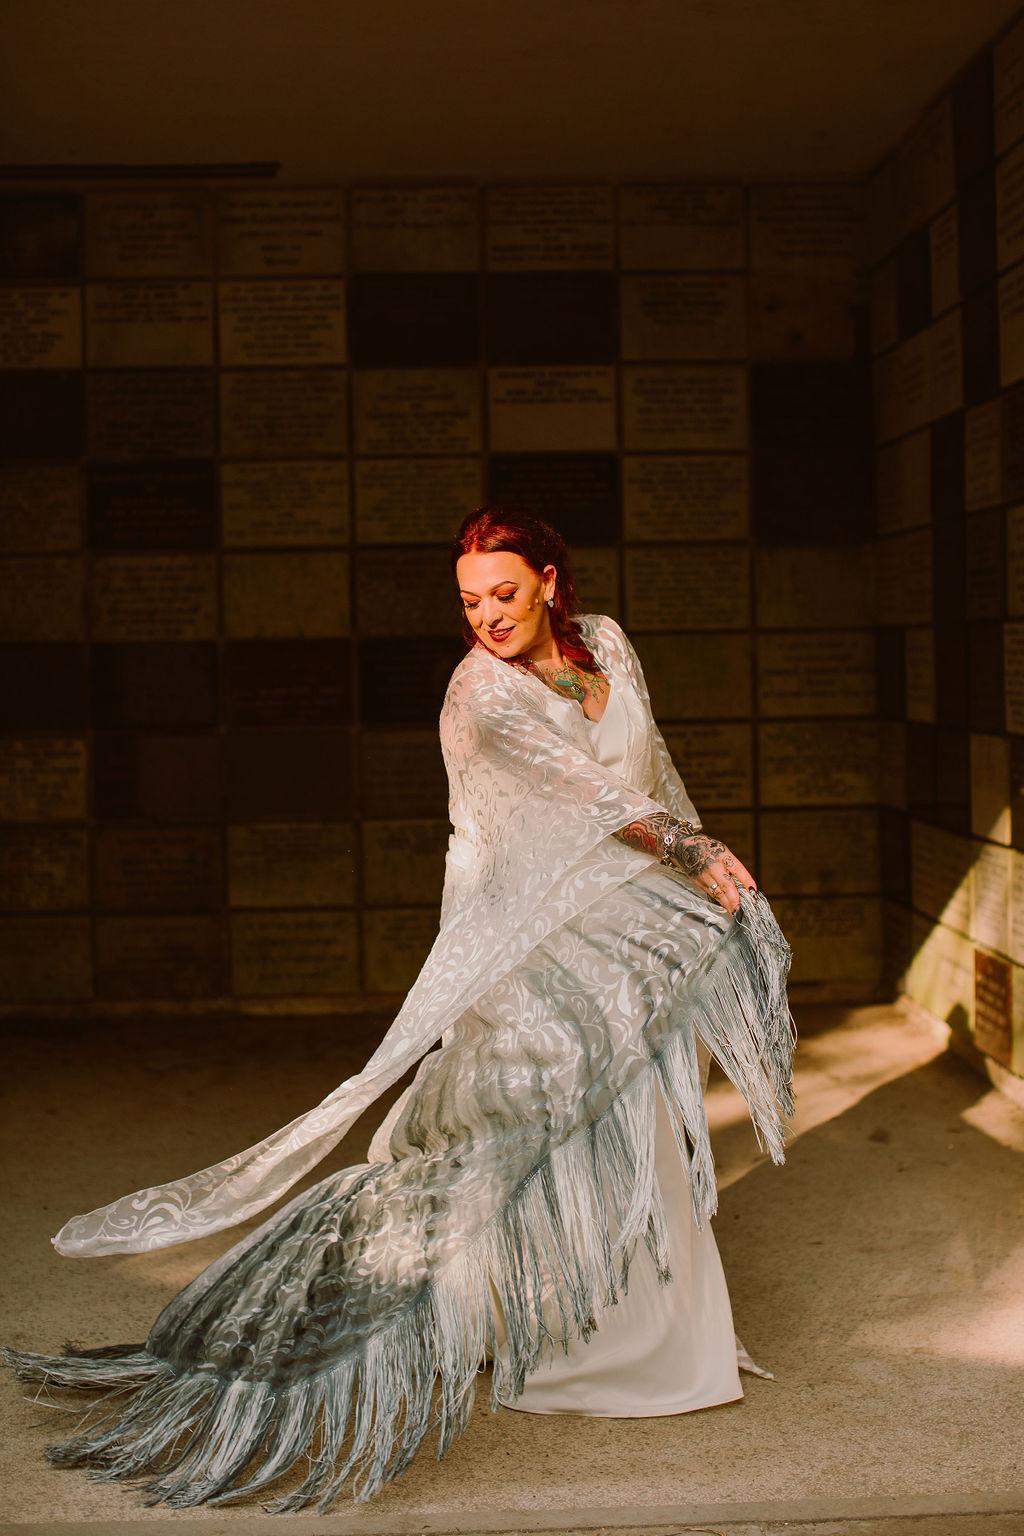 alternative wedding dress - alternative bridal wear - boho wedding dress - tassel wedding dress - dip dye wedding dress